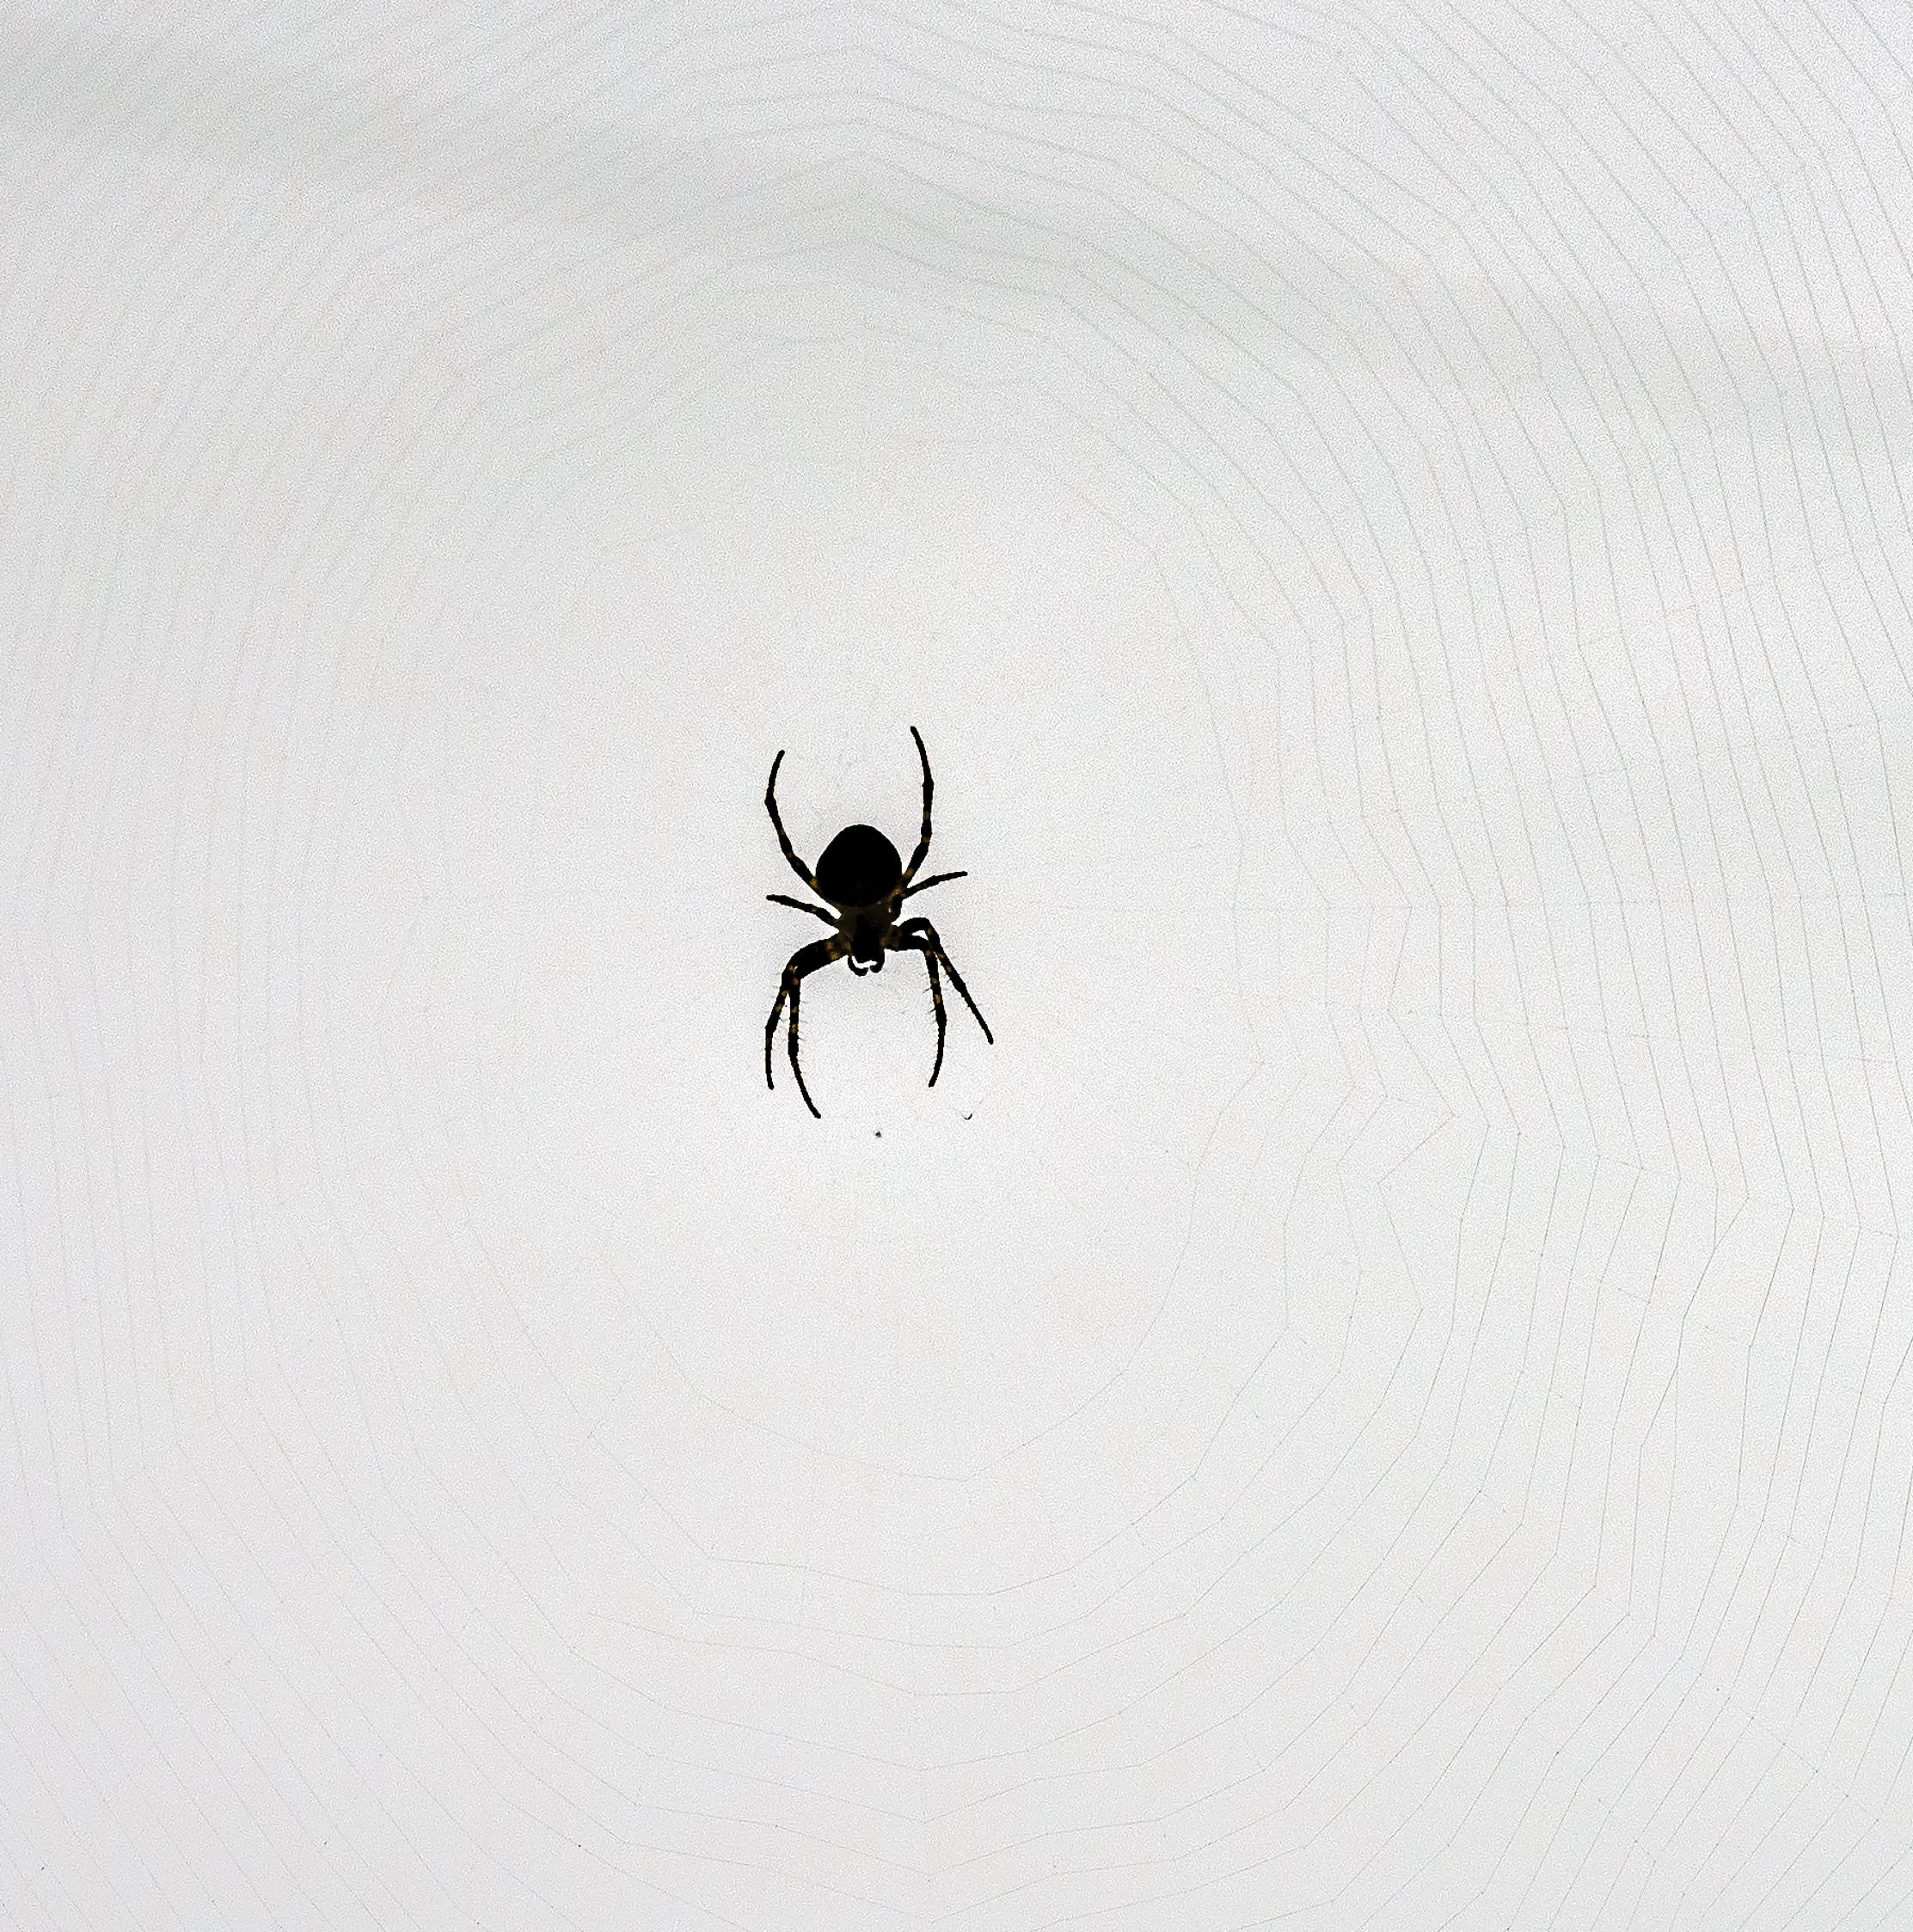 raining_so_hard_spiders_insane_zoom